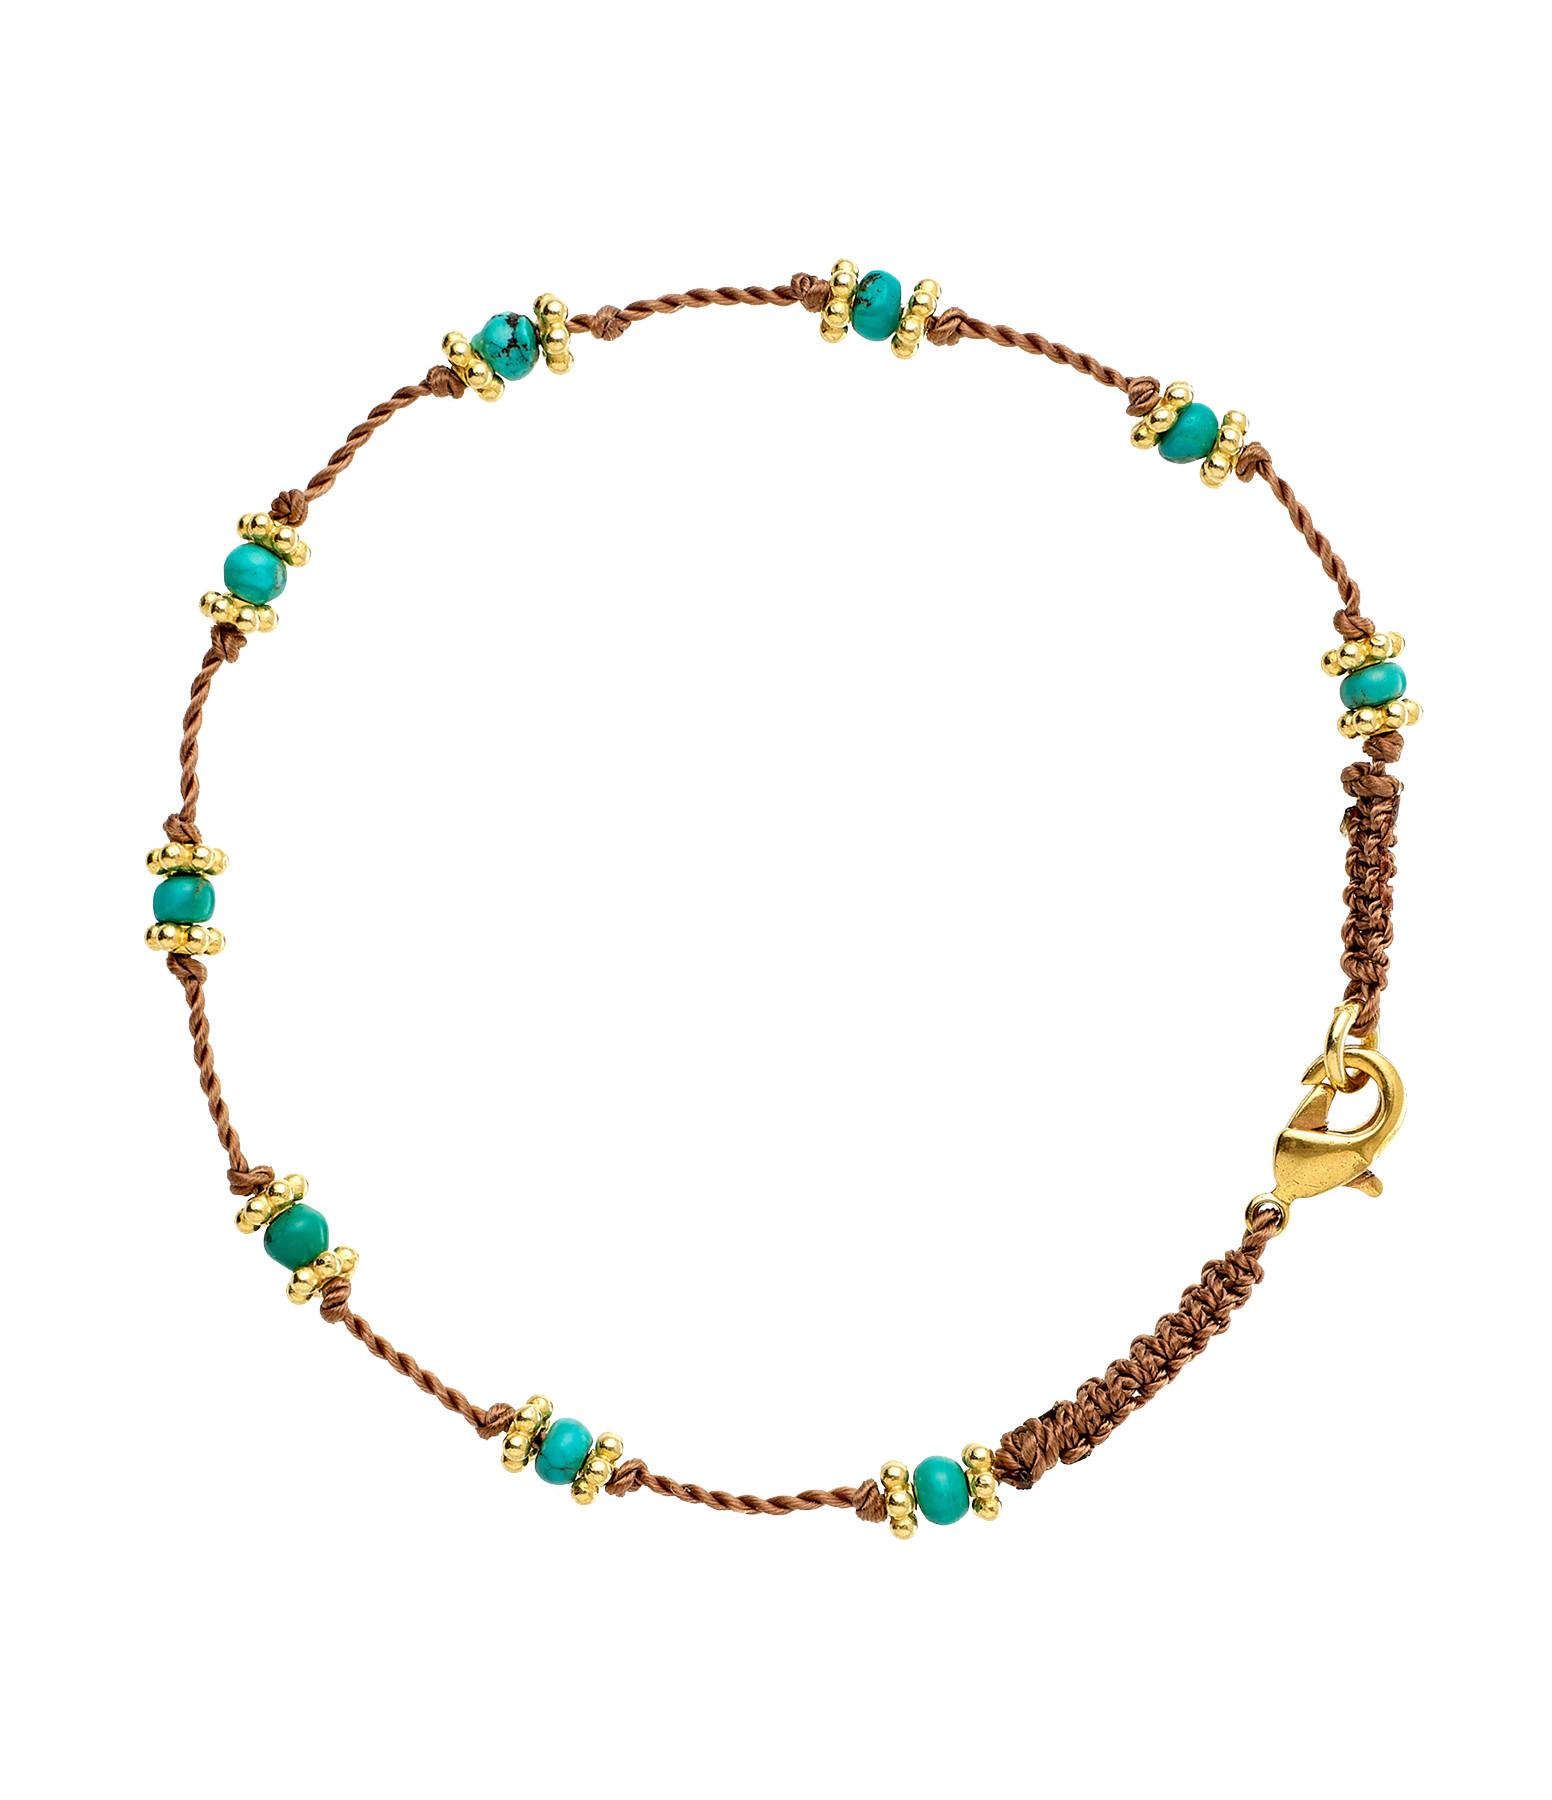 TITYARAVY - Bracelet Lotus Beige Turquoise Plaqué Or